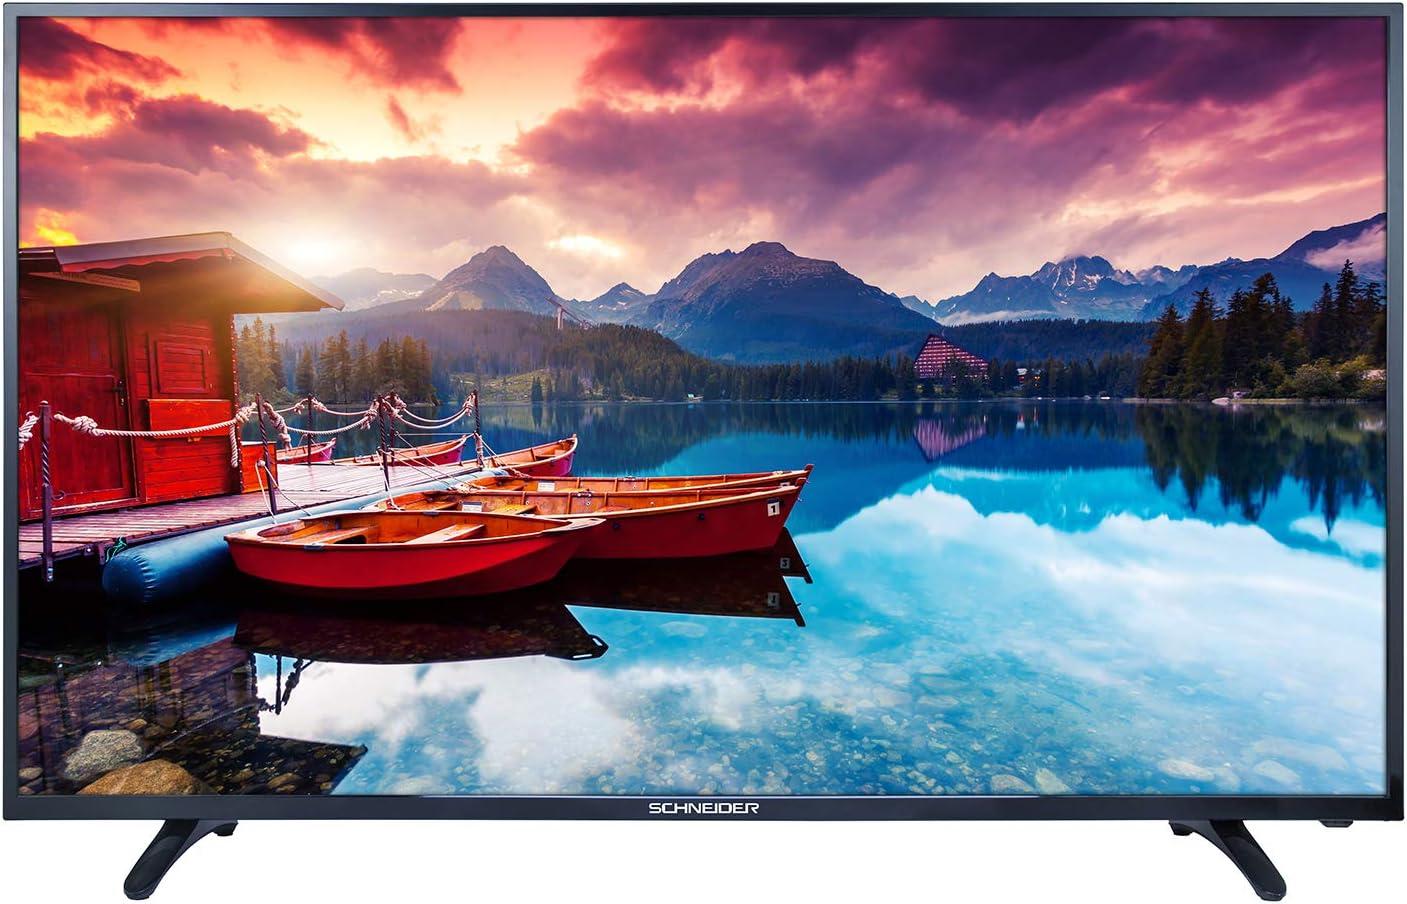 SCHNEIDER Consumer TV LED 32 HD USB PVR Negro - Televisor (81,3 cm (32